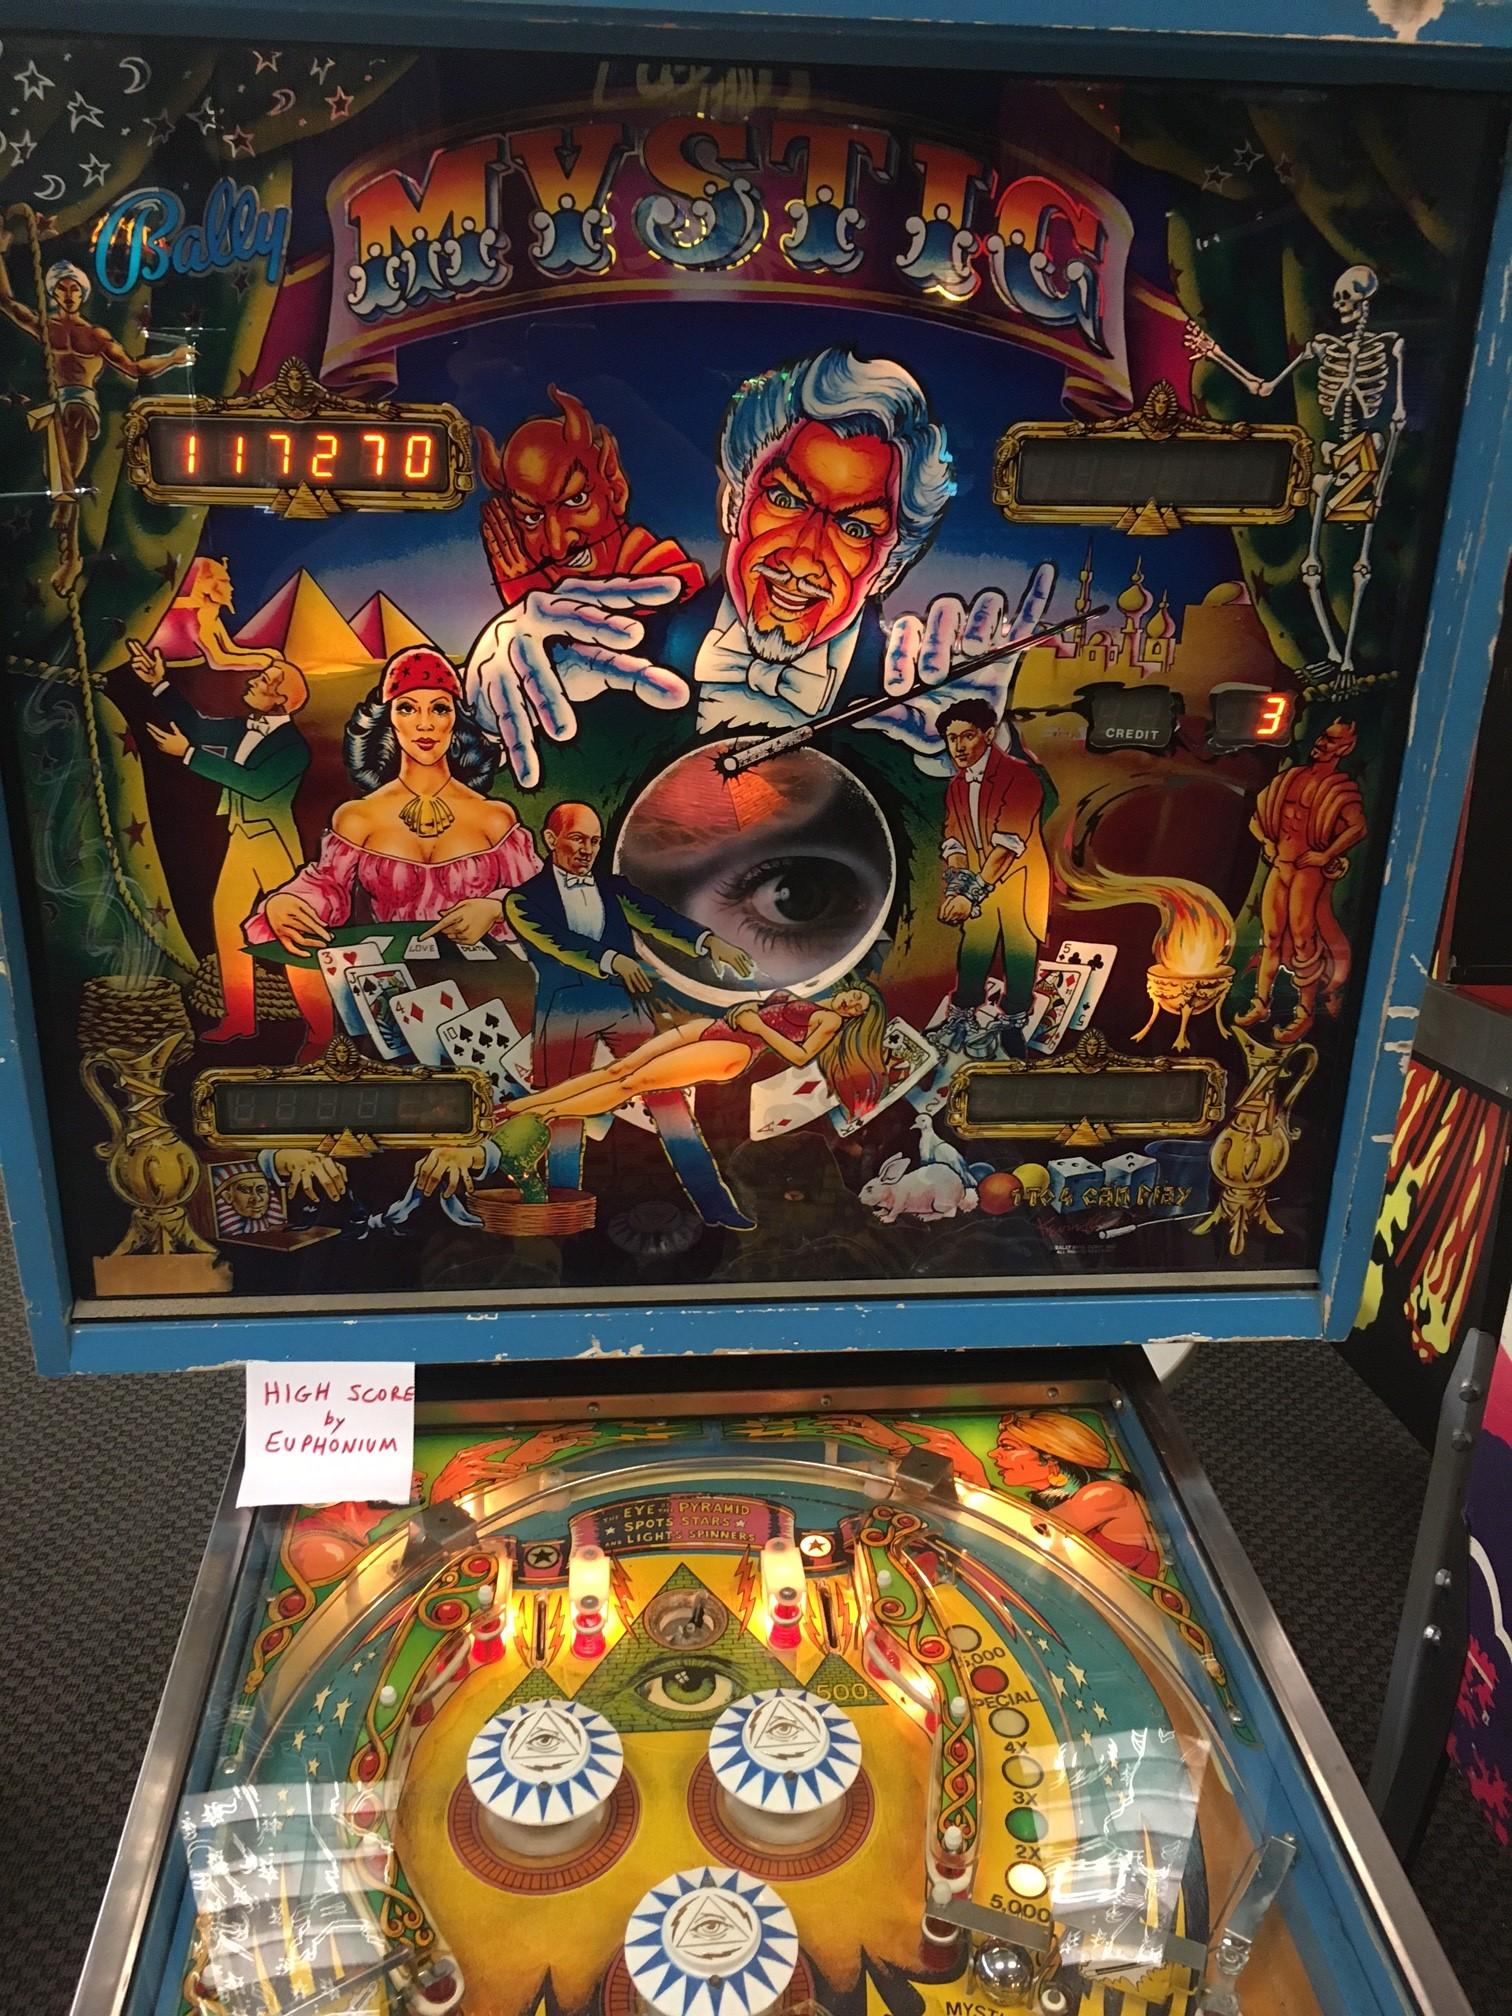 Mystic [1980 Pinball]